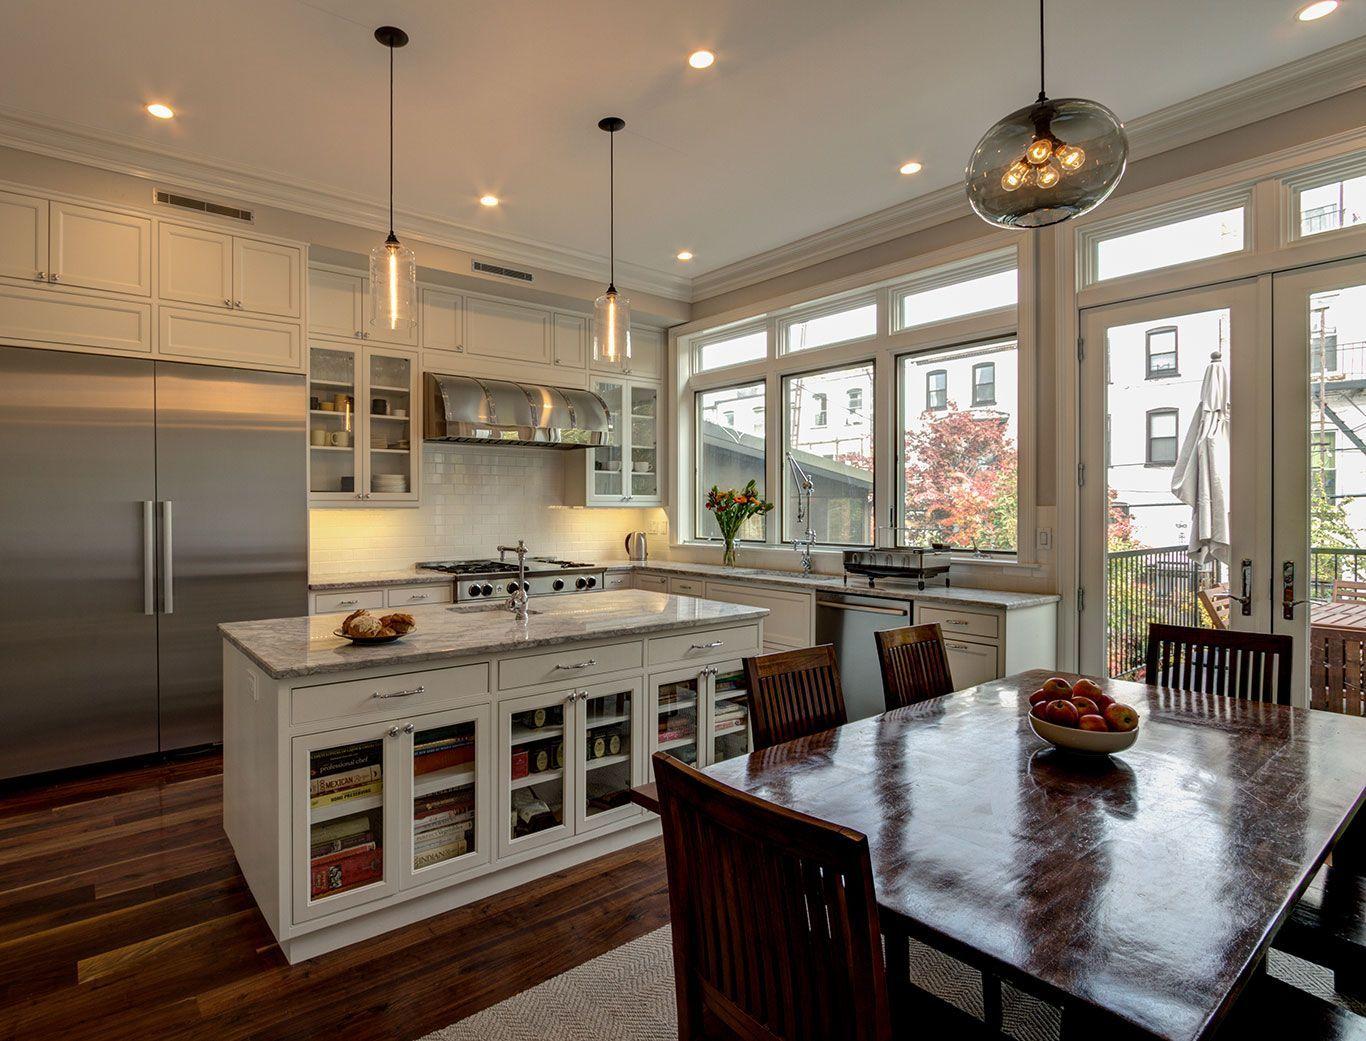 Brooklyn Brownstone Kitchen Design Ideas Pictures Remodel